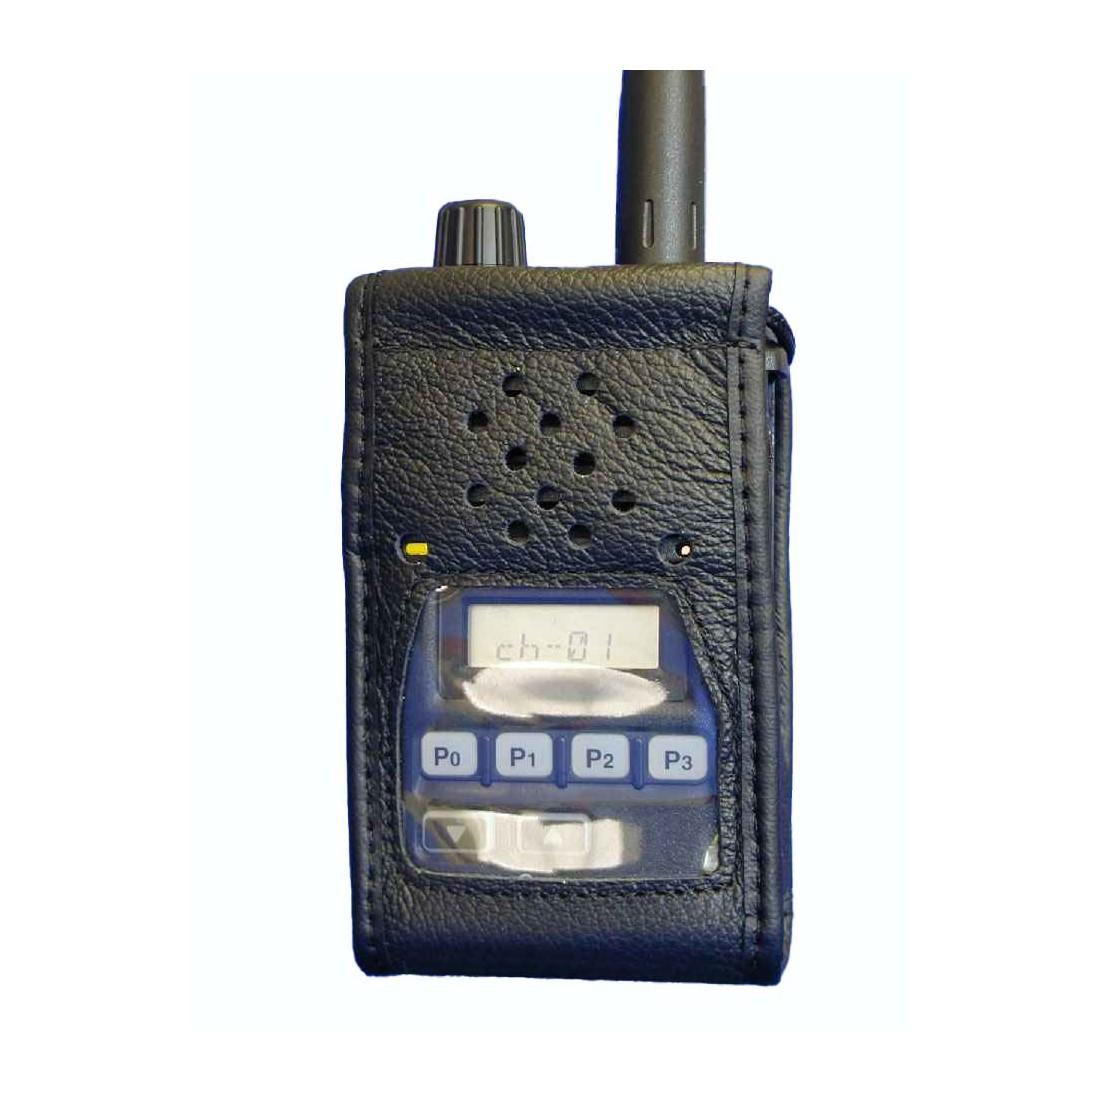 Icom F51 Radio case leather